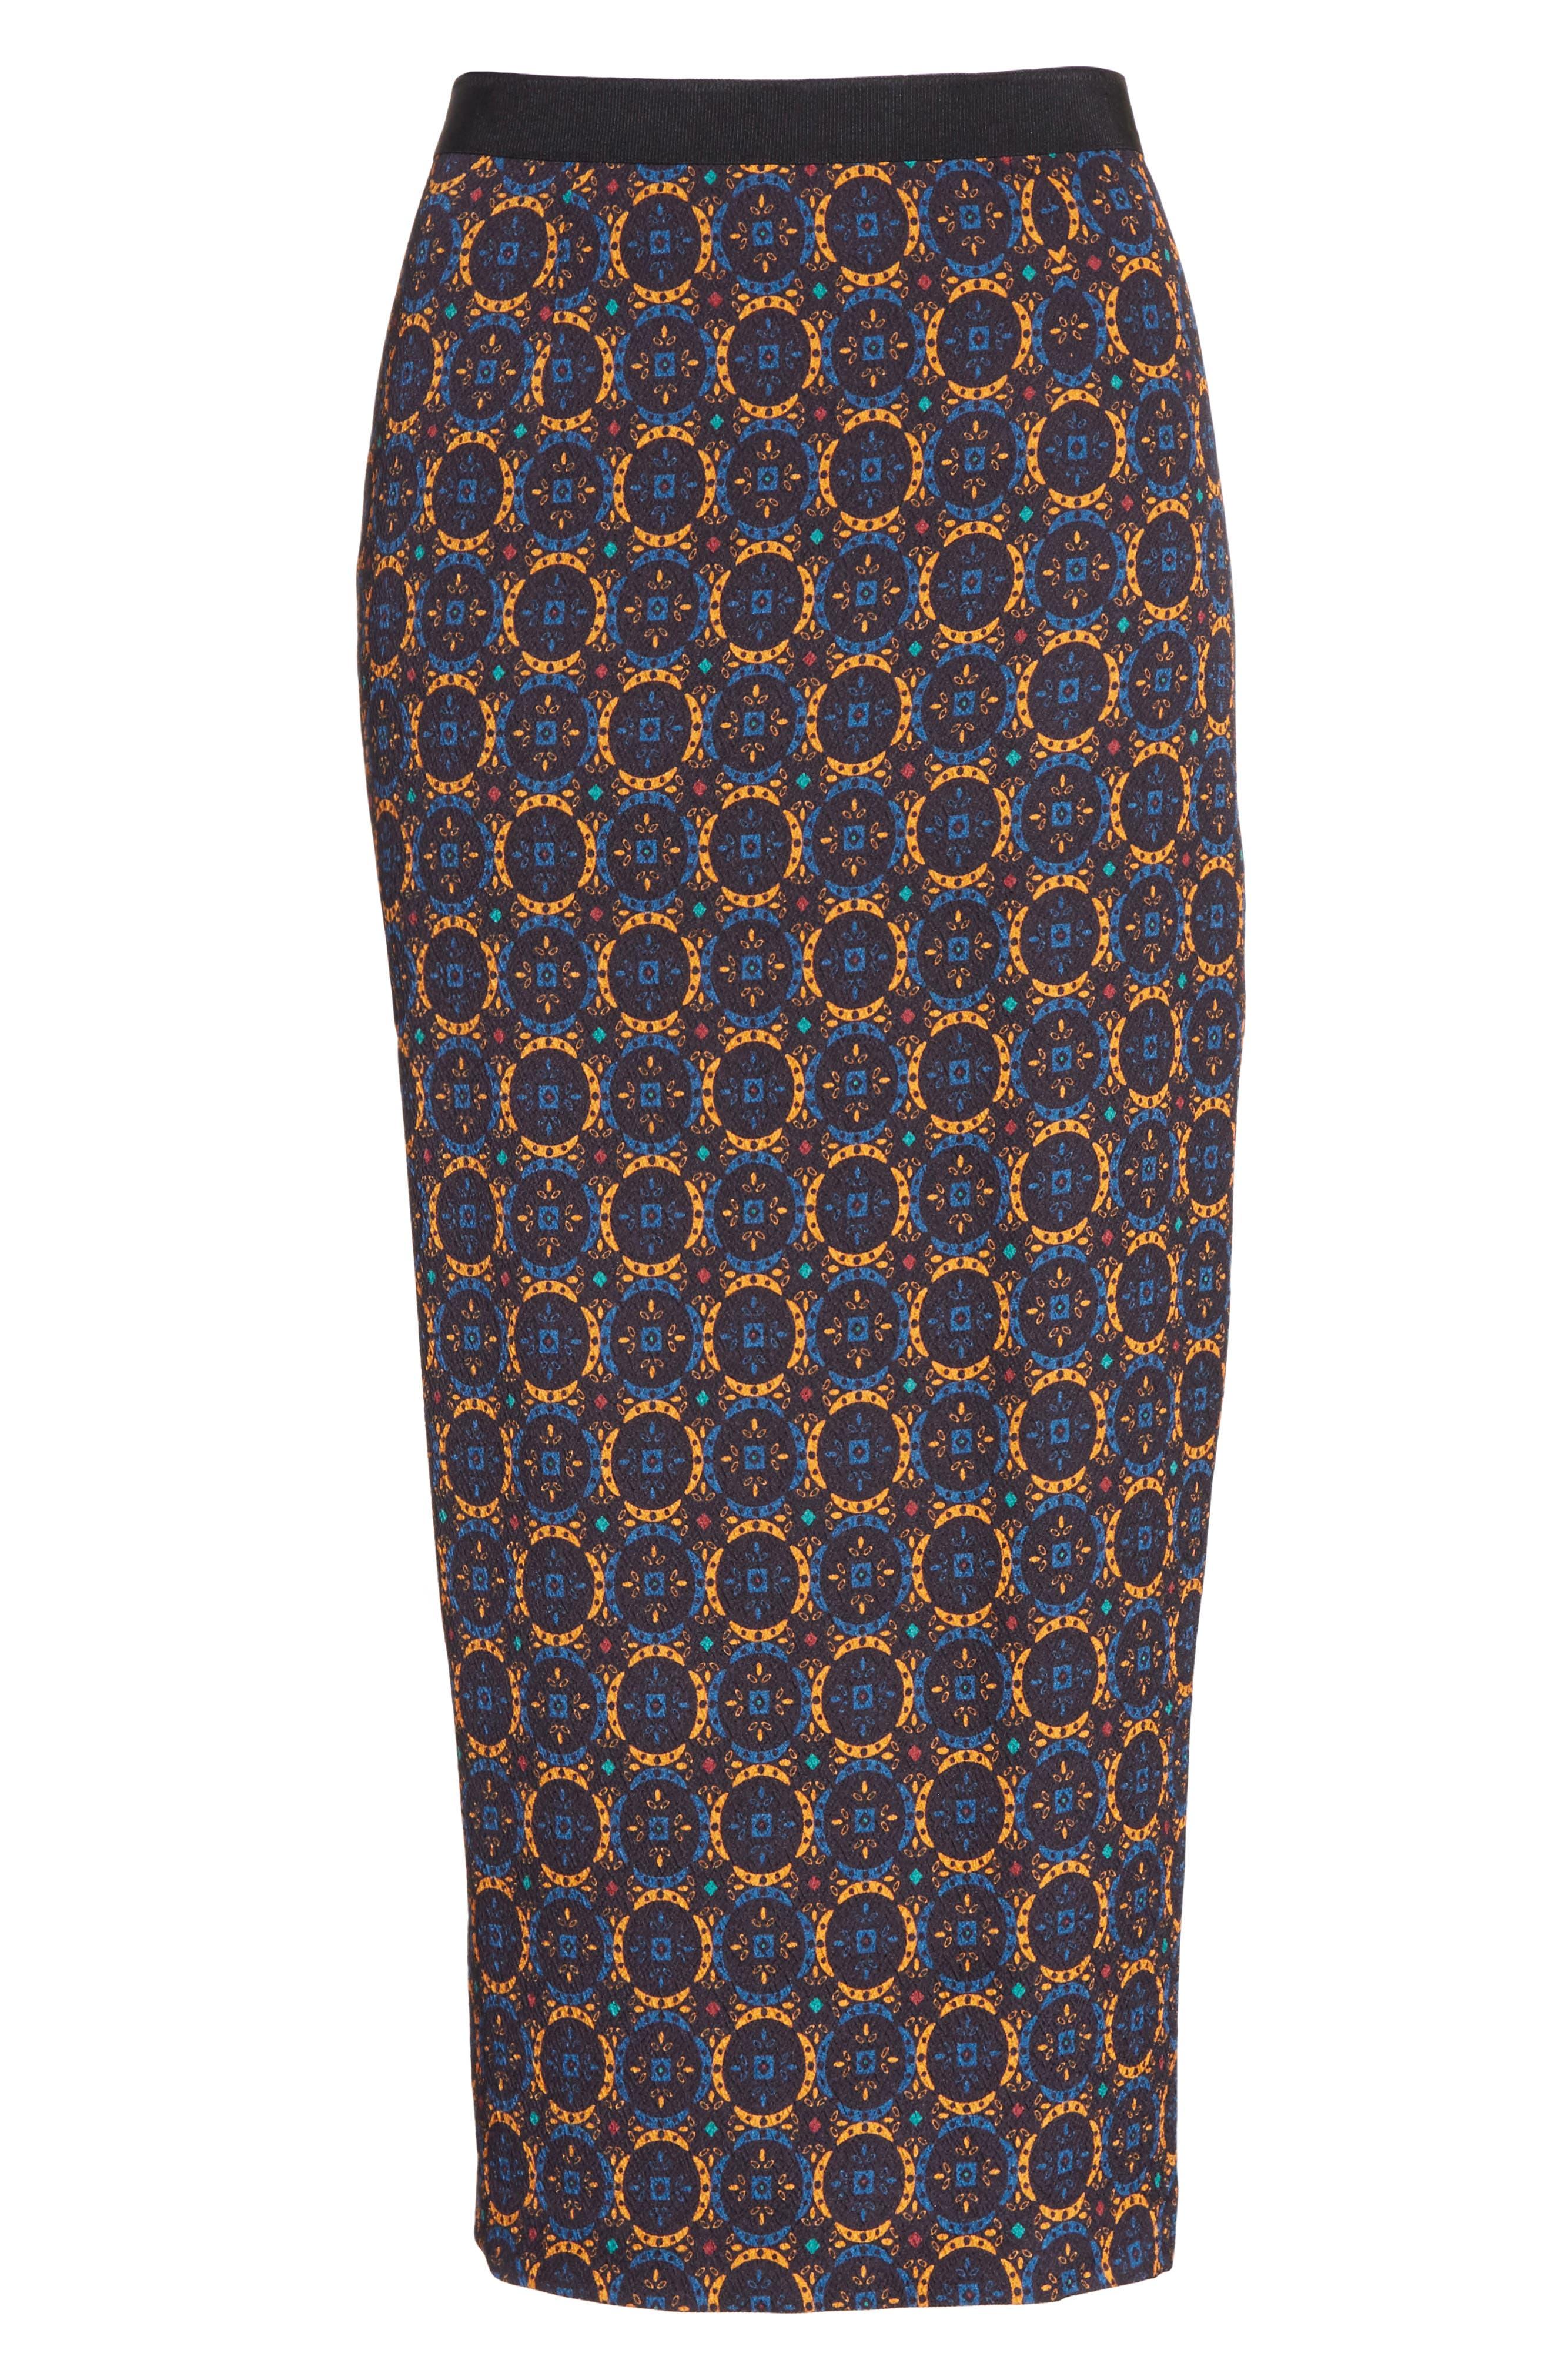 Print Stretch Silk Pencil Skirt,                             Alternate thumbnail 6, color,                             Foulard Placement